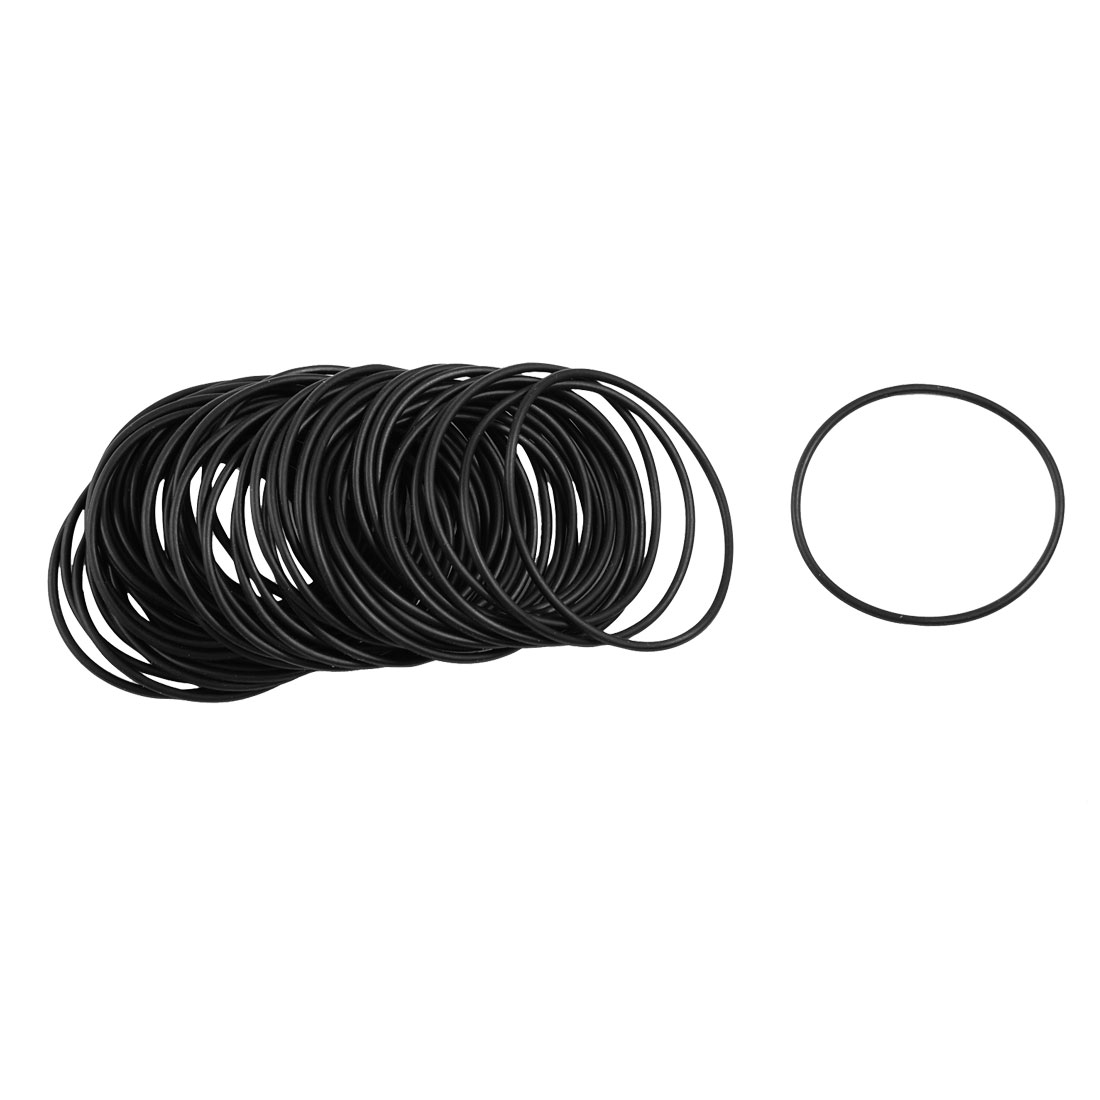 50 Pcs Mechanical Black NBR O Rings Oil Seal Washers 39mm x 1.5mm x 36mm